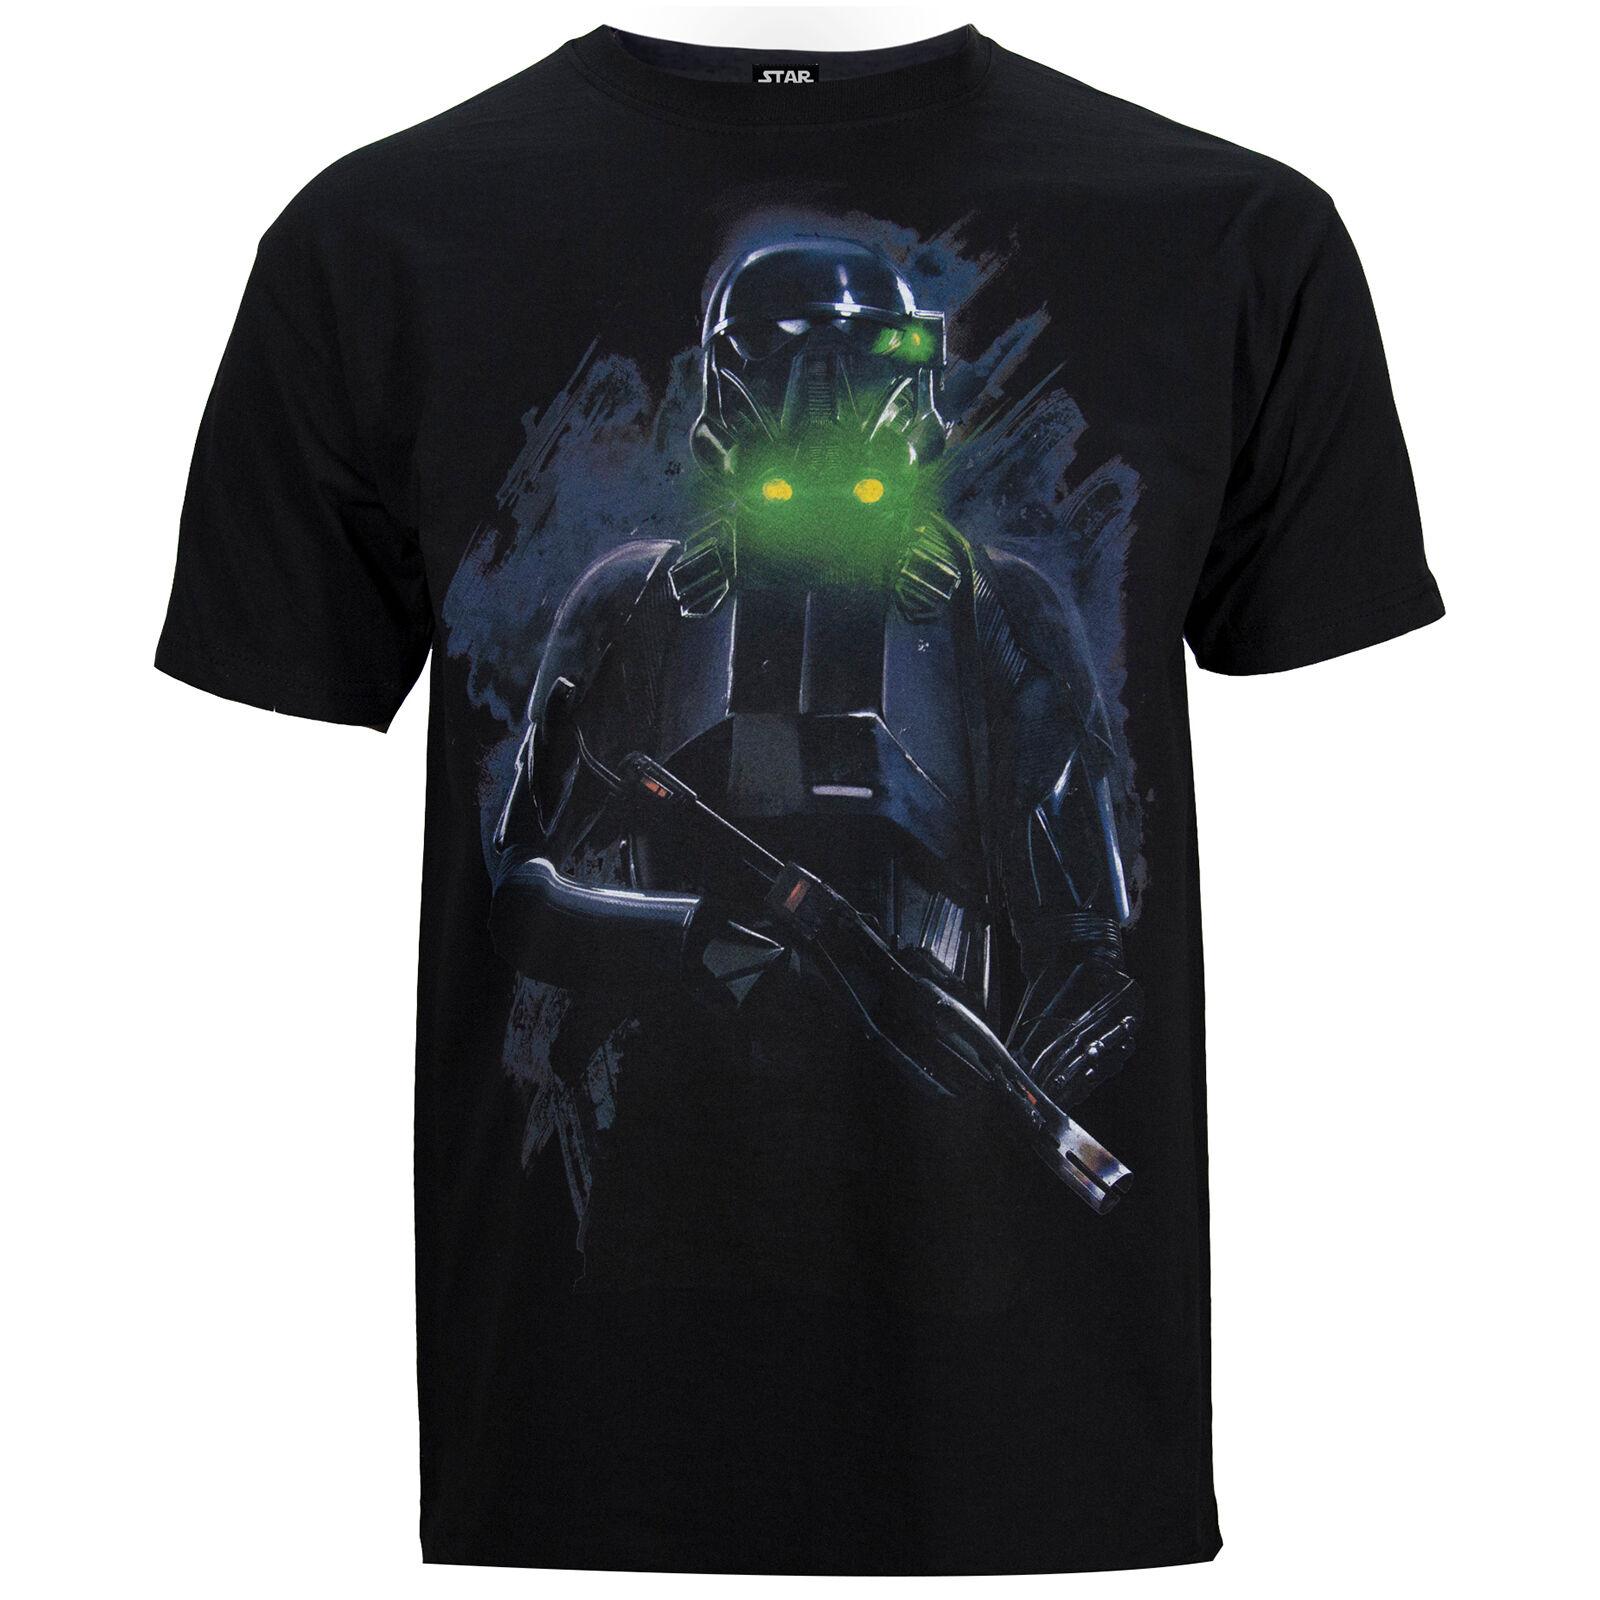 Geek Clothing Star Wars Rogue One Men's Death Trooper T-Shirt - Black - L - Black